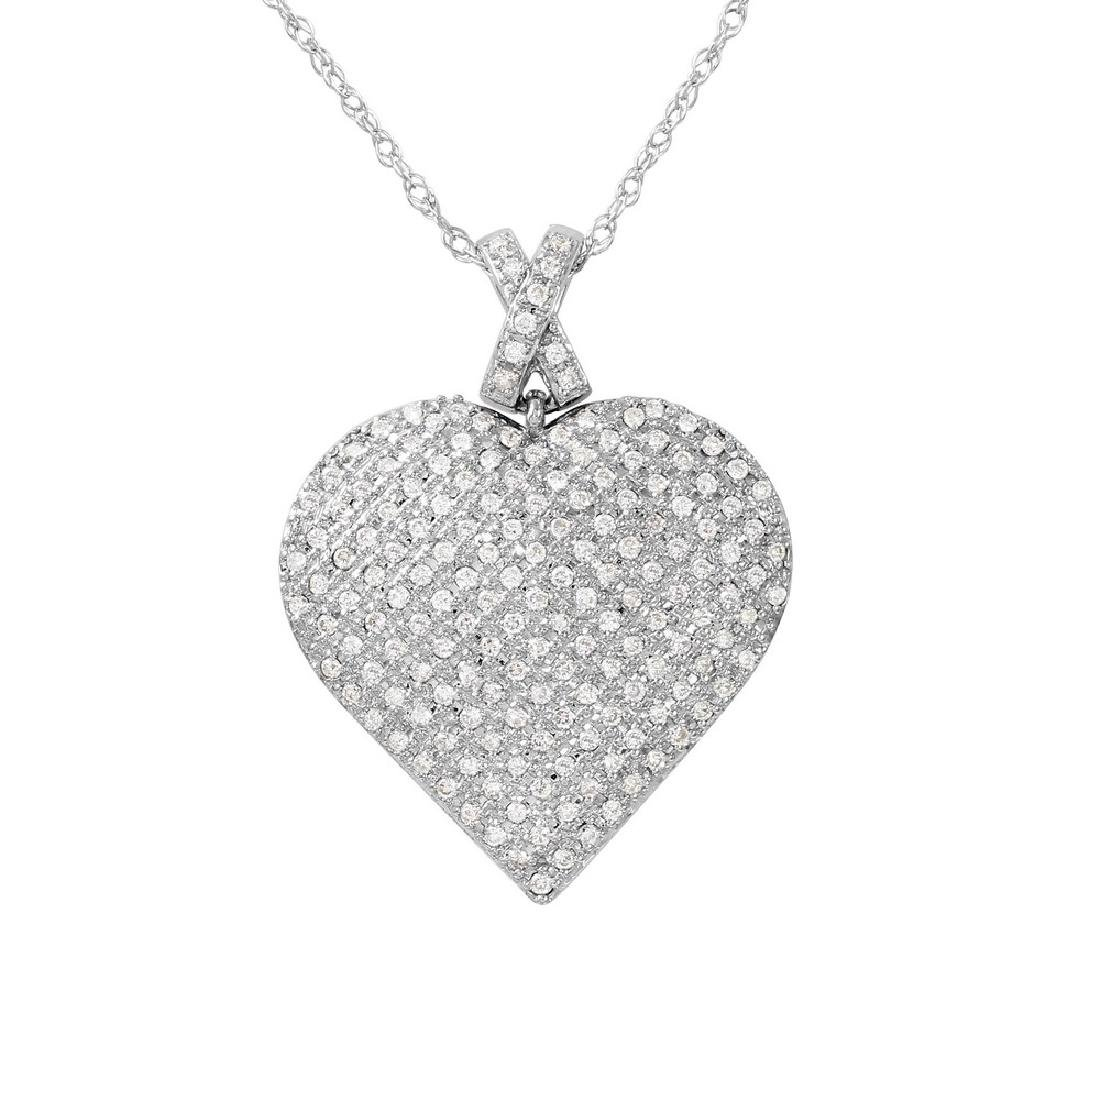 0.5 CTW White Round Diamond Slider with Chain 14K White